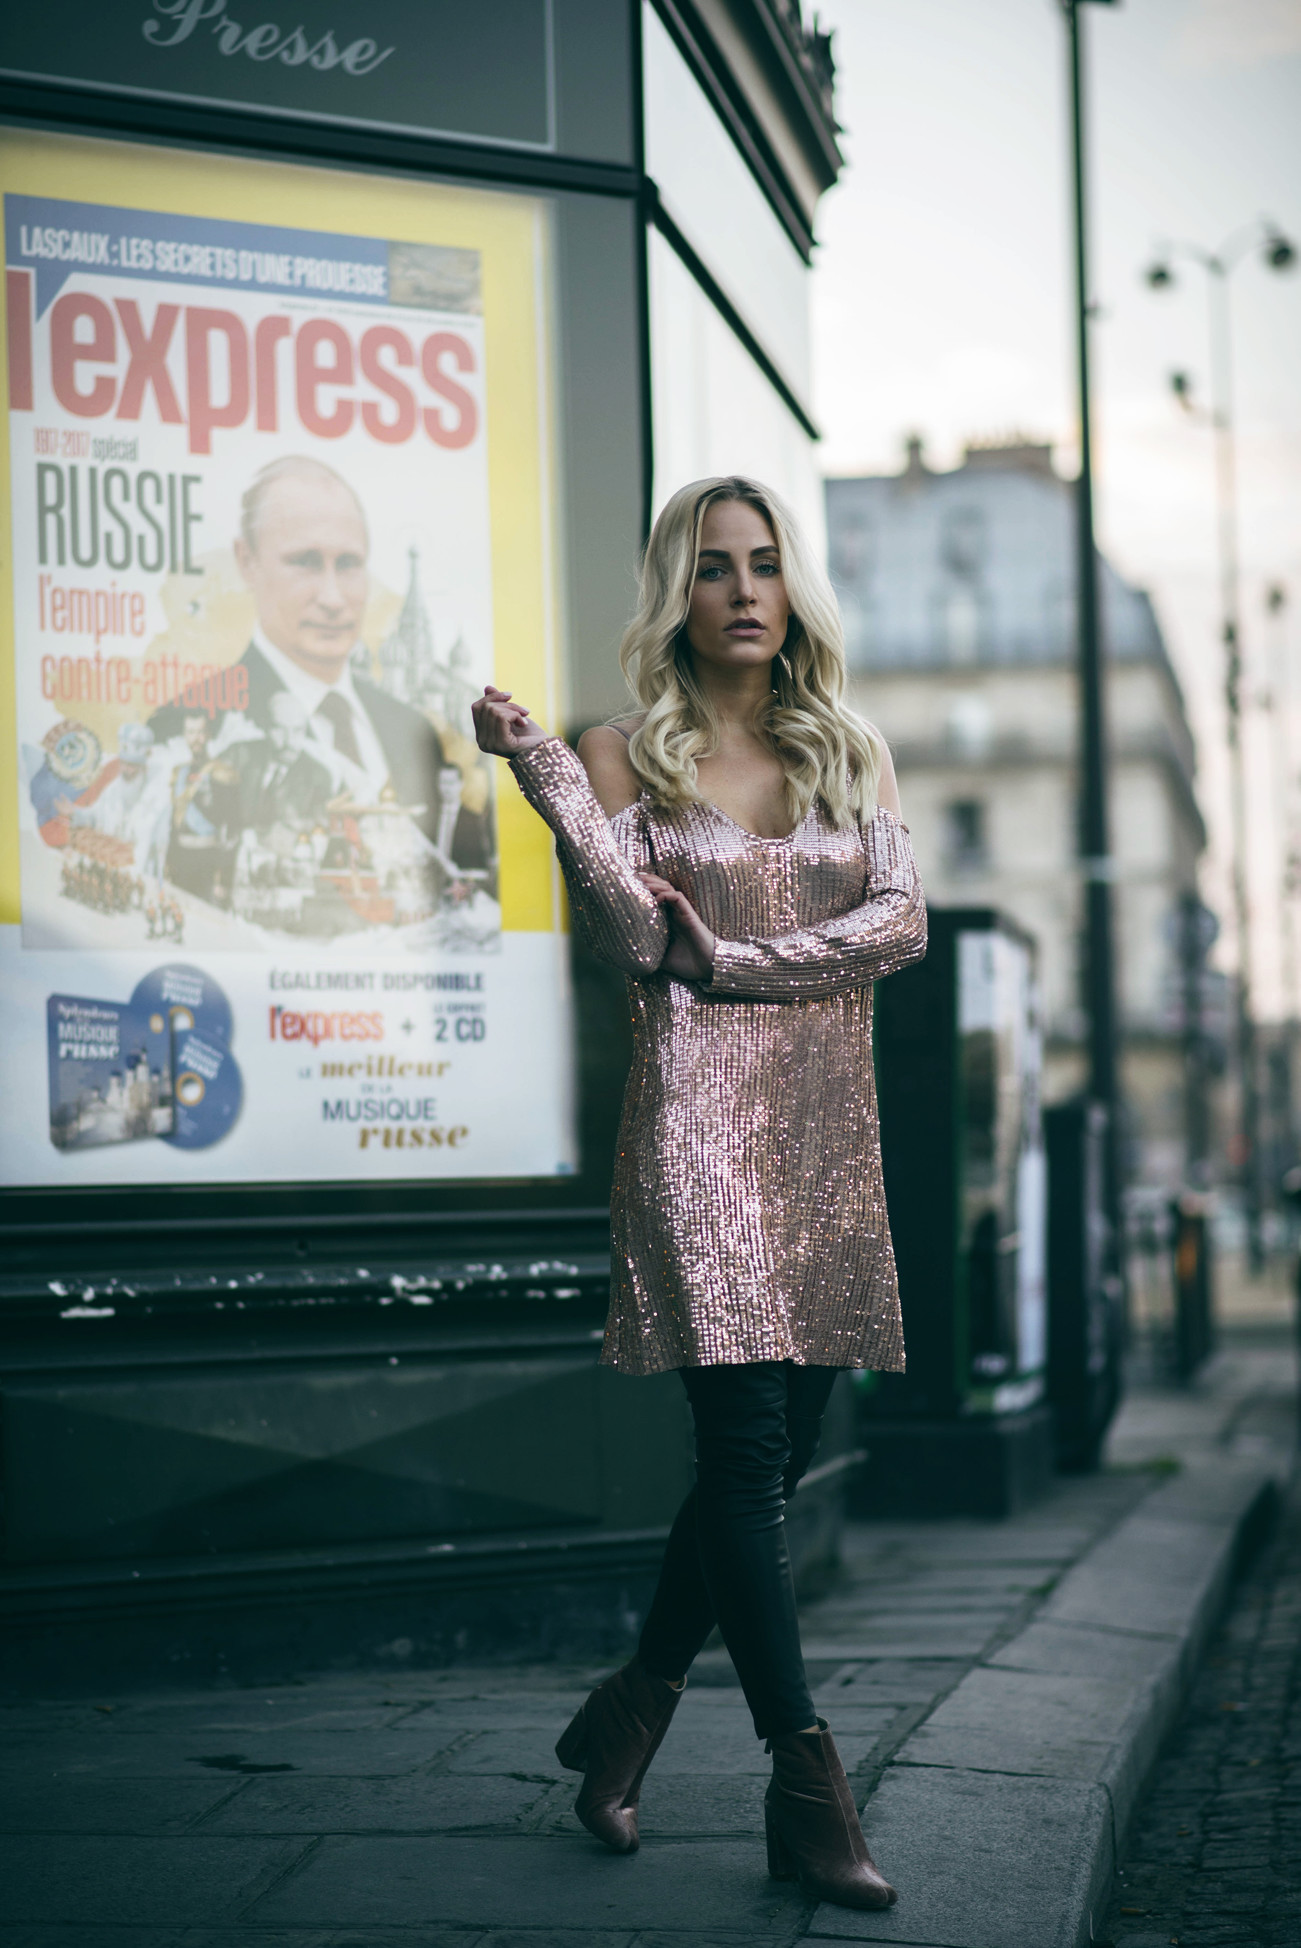 fashionblogger-blogger-streetstyle-paris-sequinsophia-1-___00000-9237